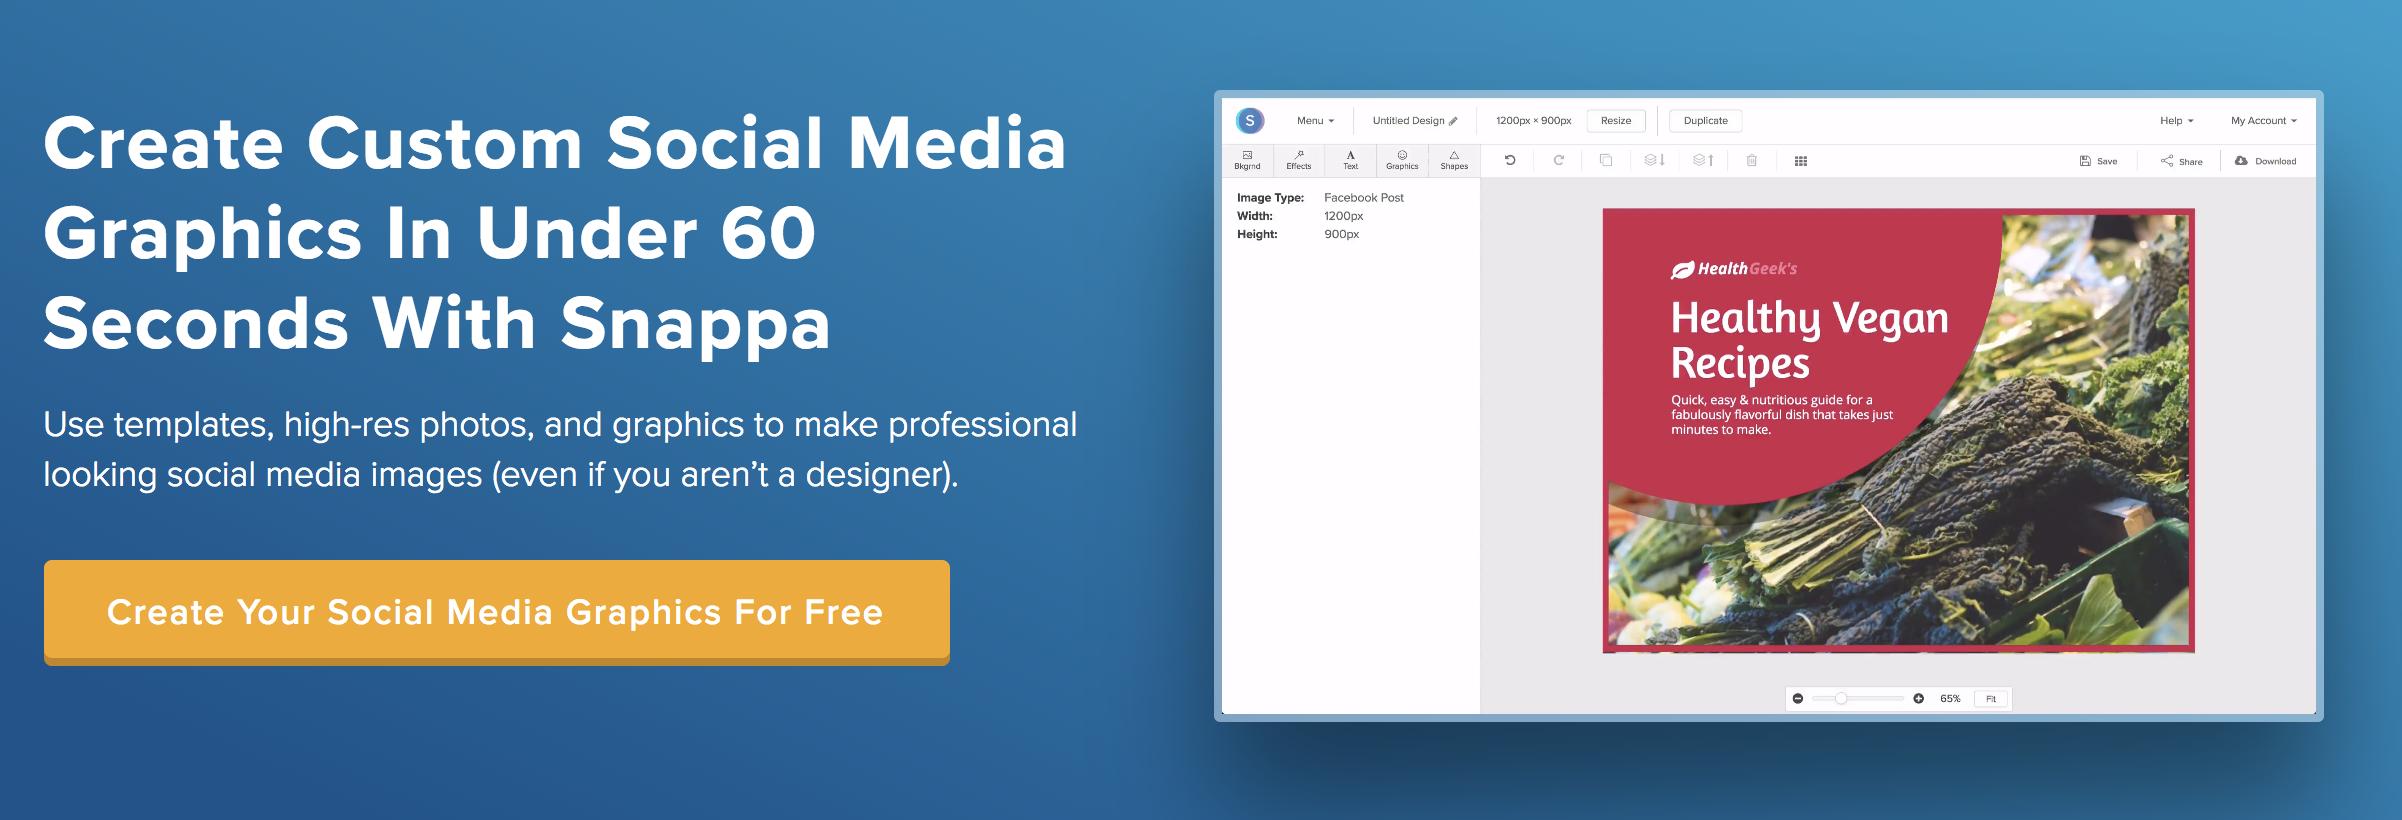 snappa social media image creator